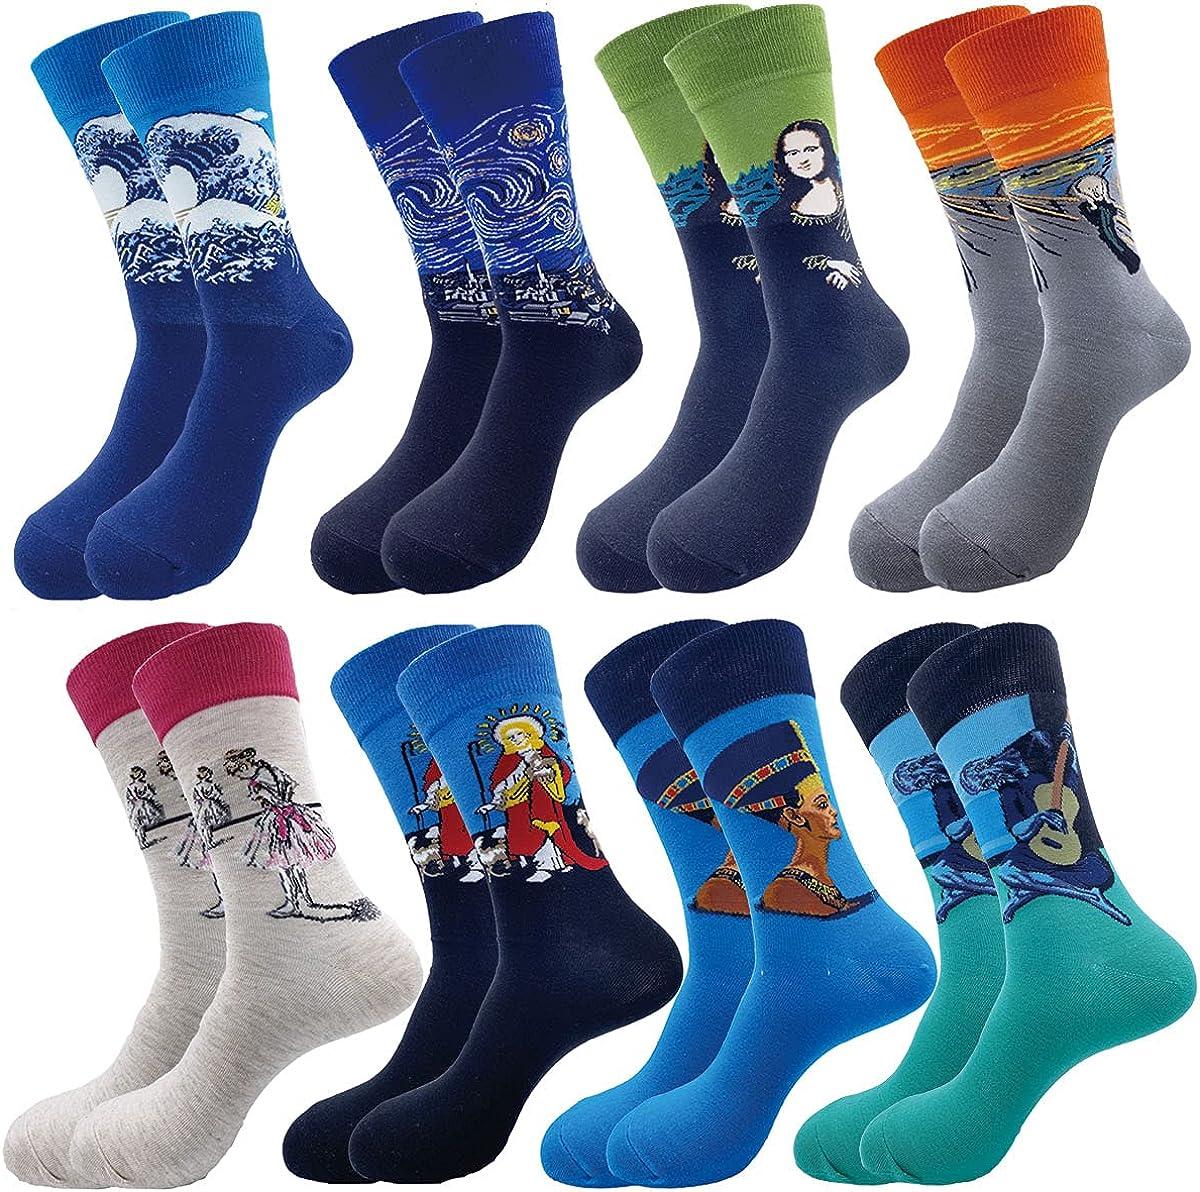 rockbottom Fun Socks ,Funny Socks for Men Novelty Crazy Crew Dress Socks ,Cool Cute Food Graphic Animal Socks